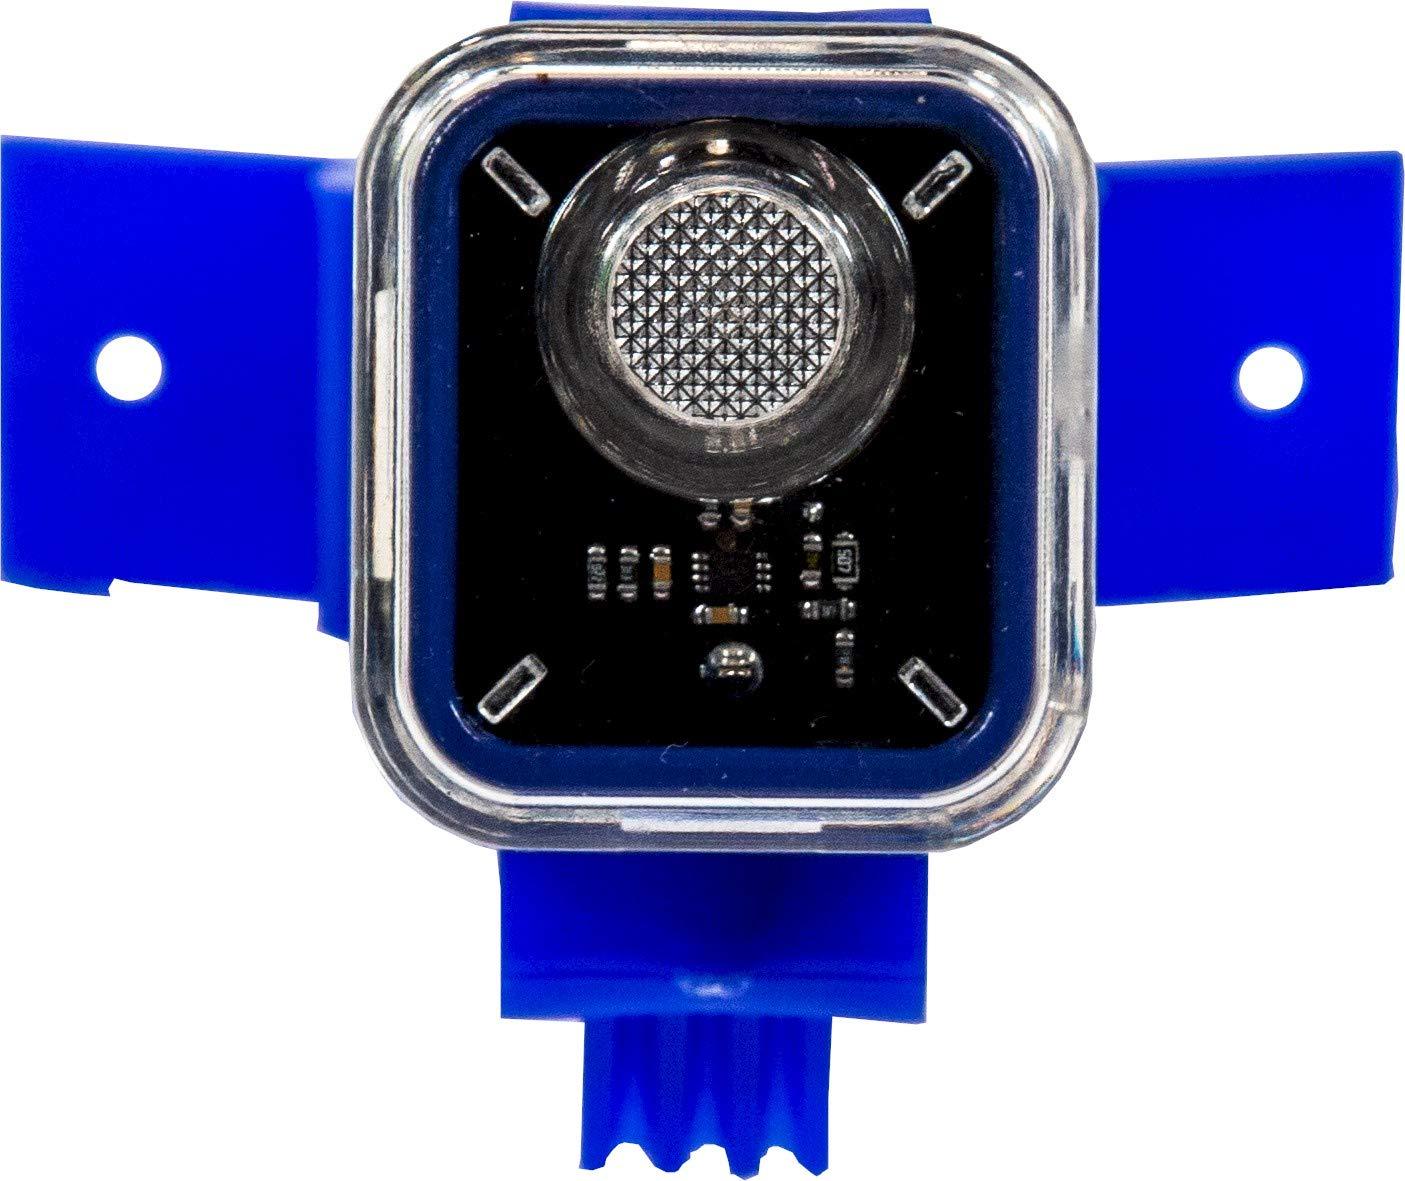 Farm Innovators INSL-1 Insulight Electric Fence Insulator with Live Monitor, Blue by Farm Innovators